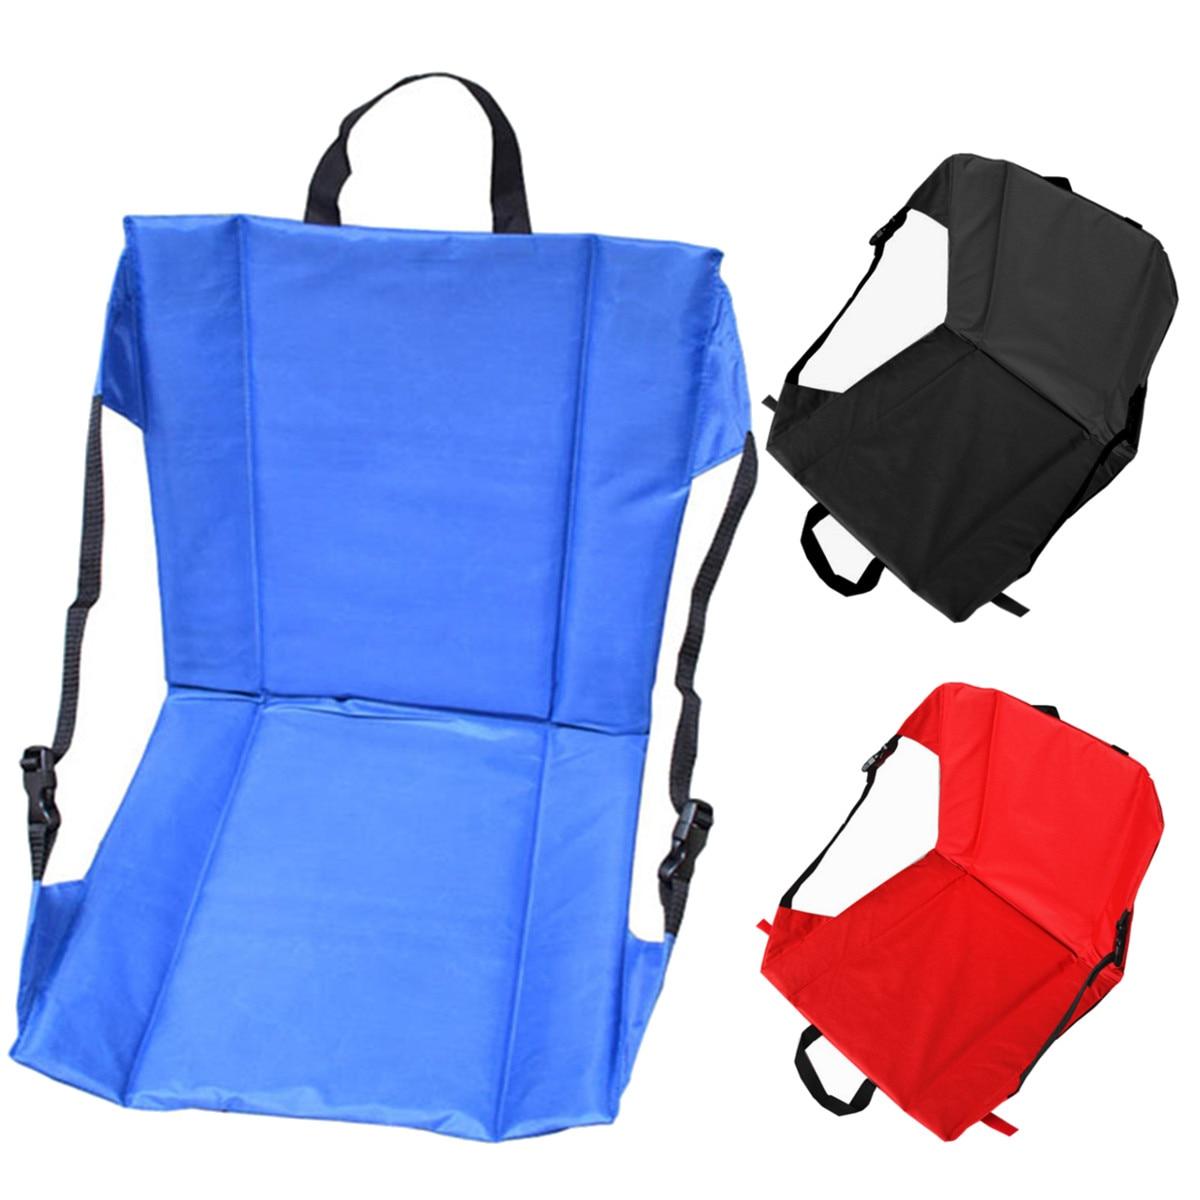 41x41x4cm Portable Foldable Outdoor Picnic Camping Beach Chair Garden Sofa Chair Garden Chair Seats Soft Stadium Seat Cushion